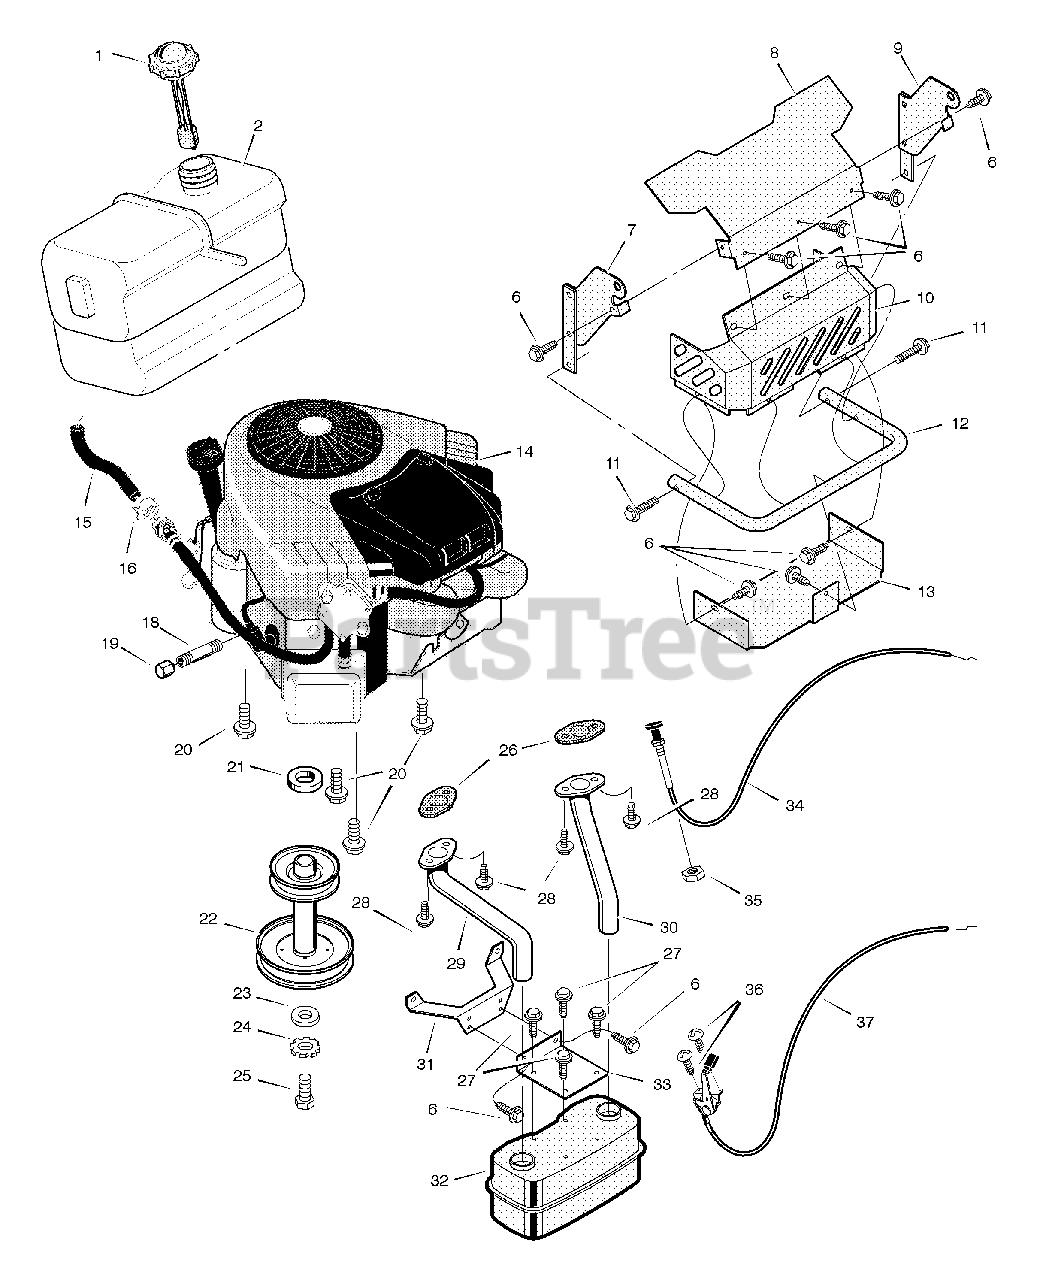 Stanley X692a